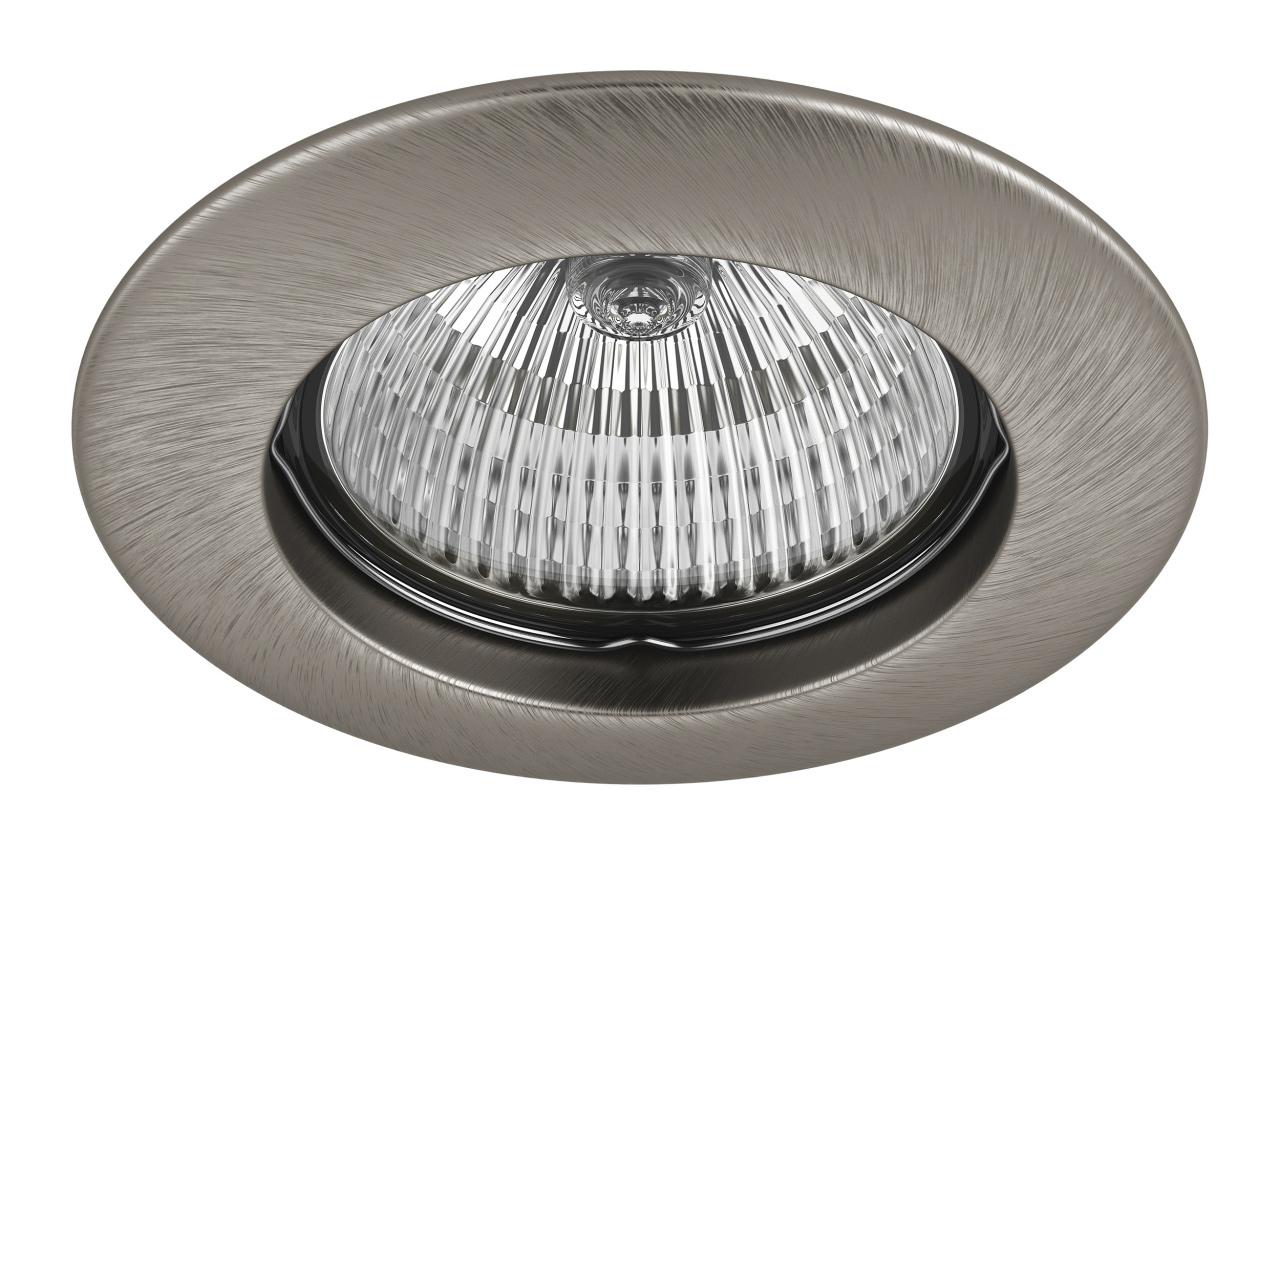 Светильник Teso FIX MR16 / HP16 никель Lightstar 011075